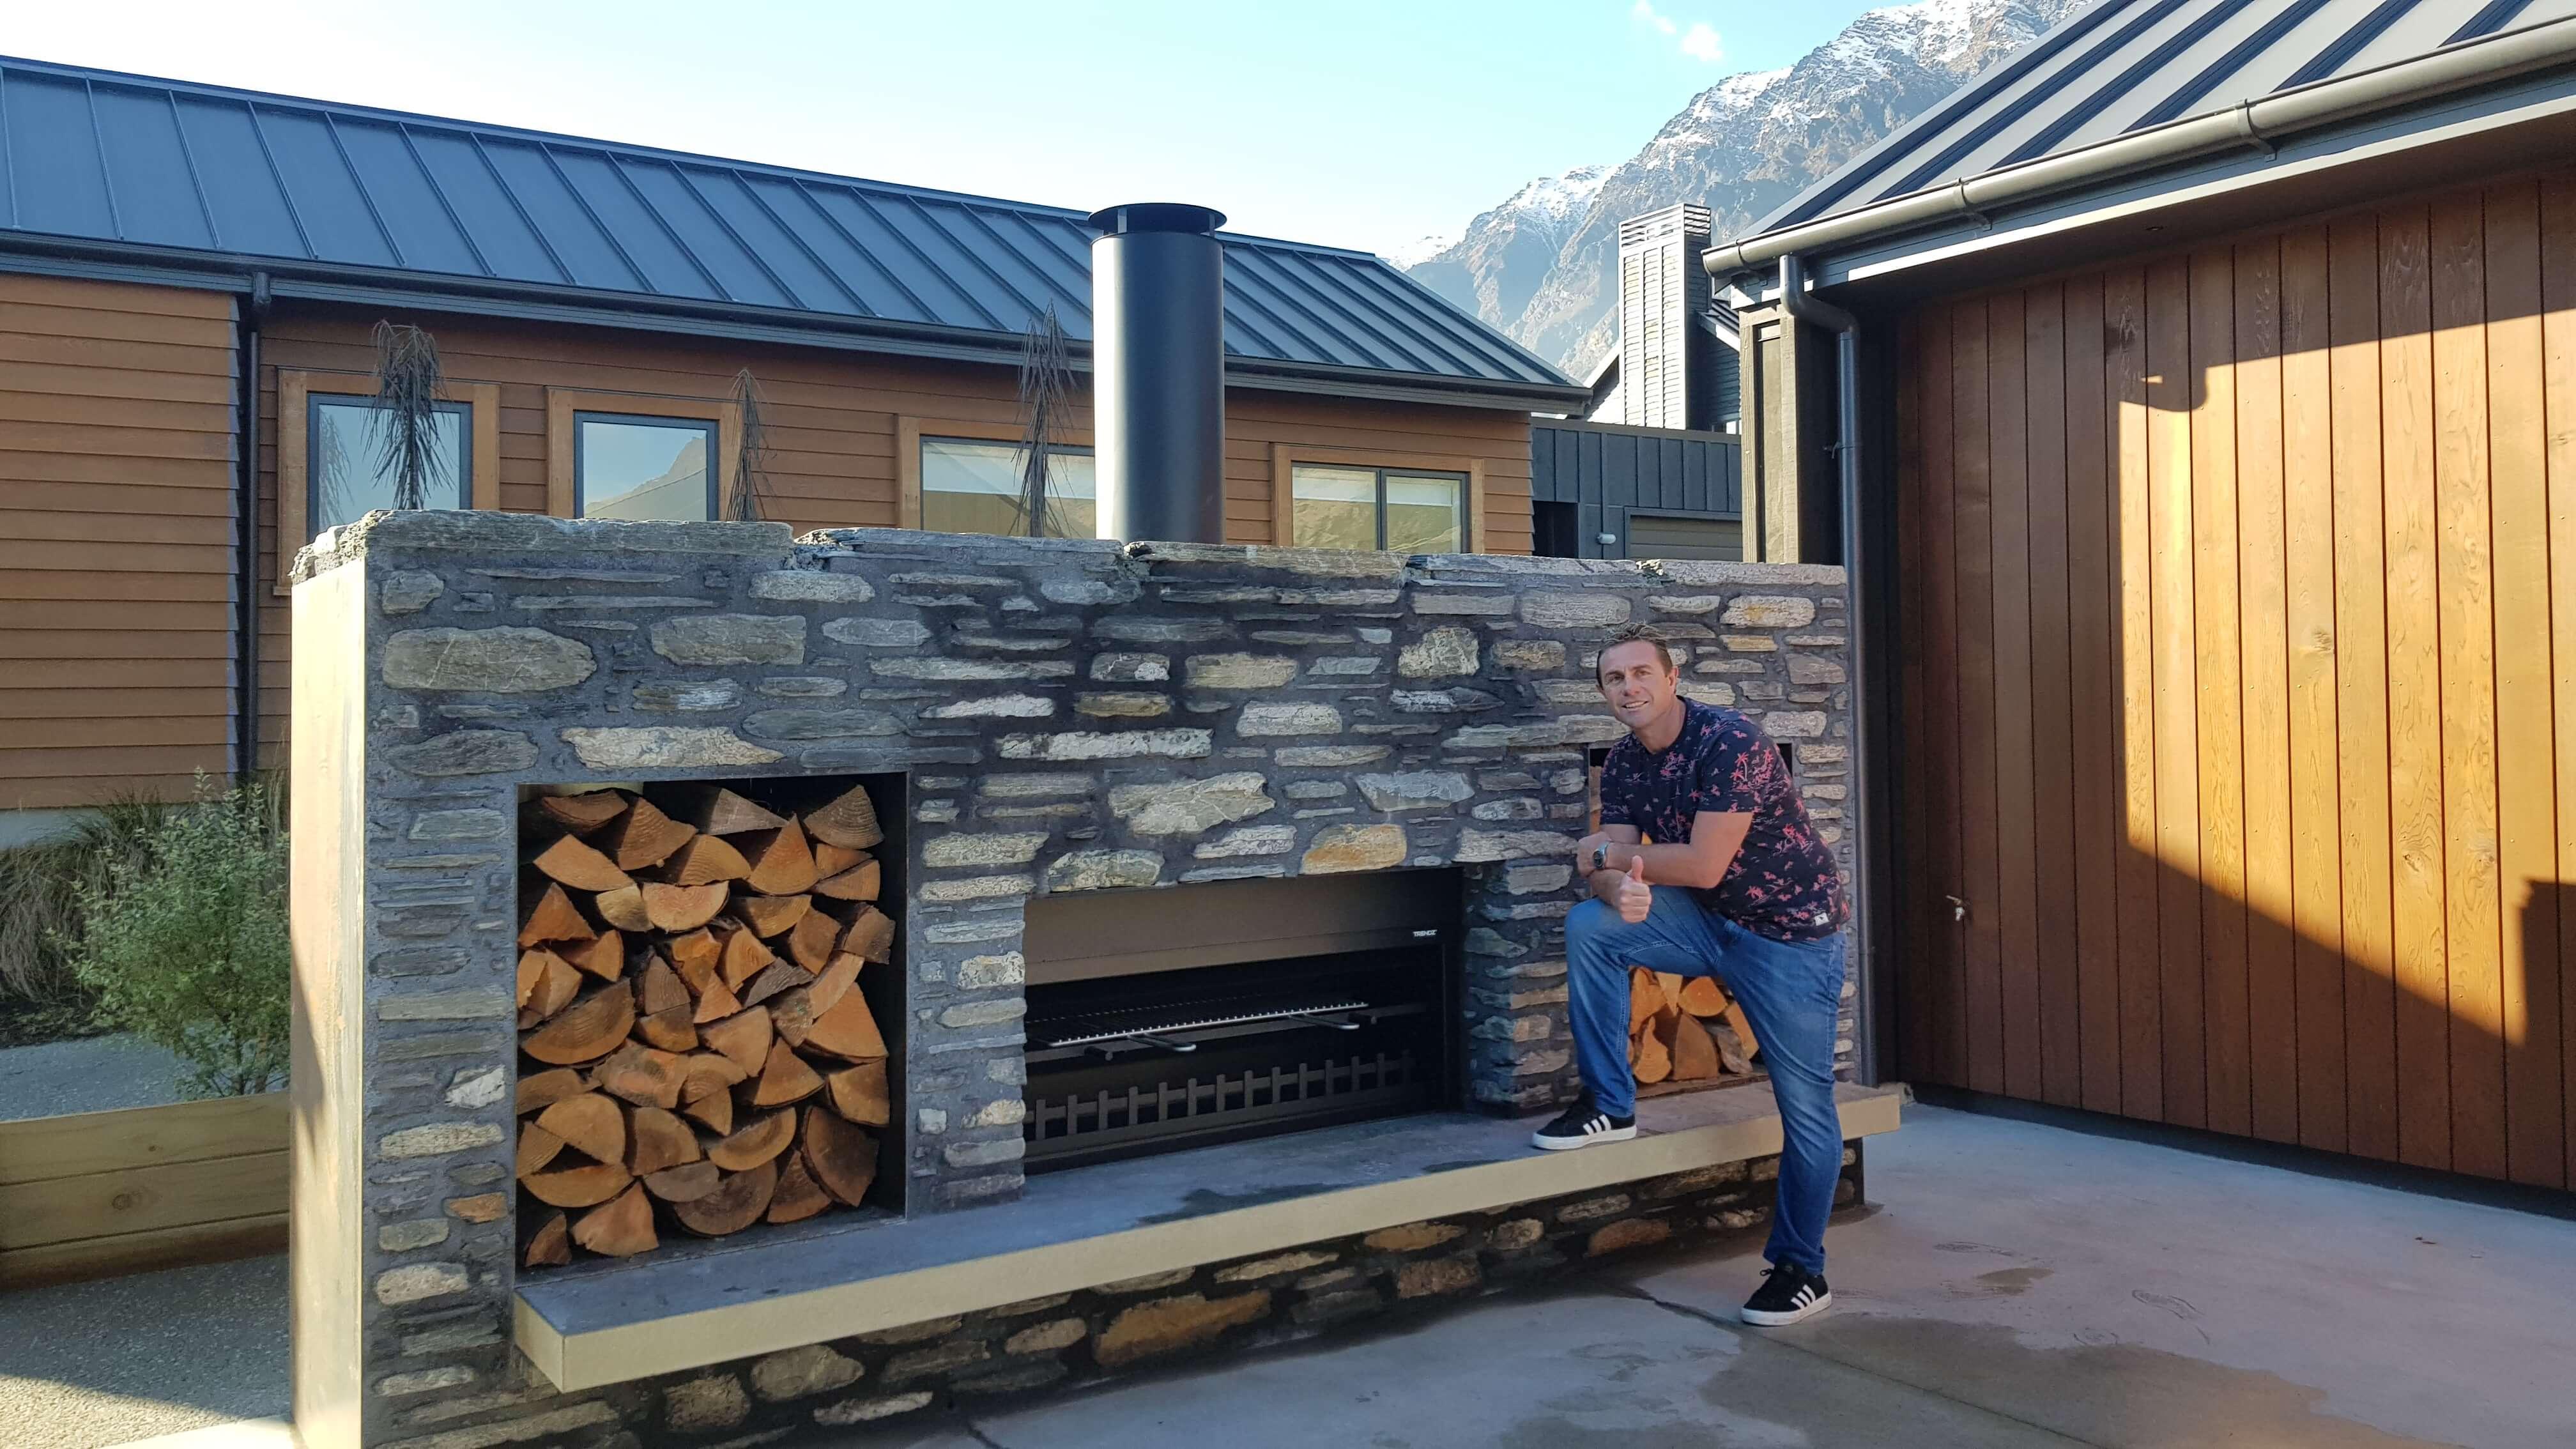 Justin Marshall's custom made outdoor fireplace